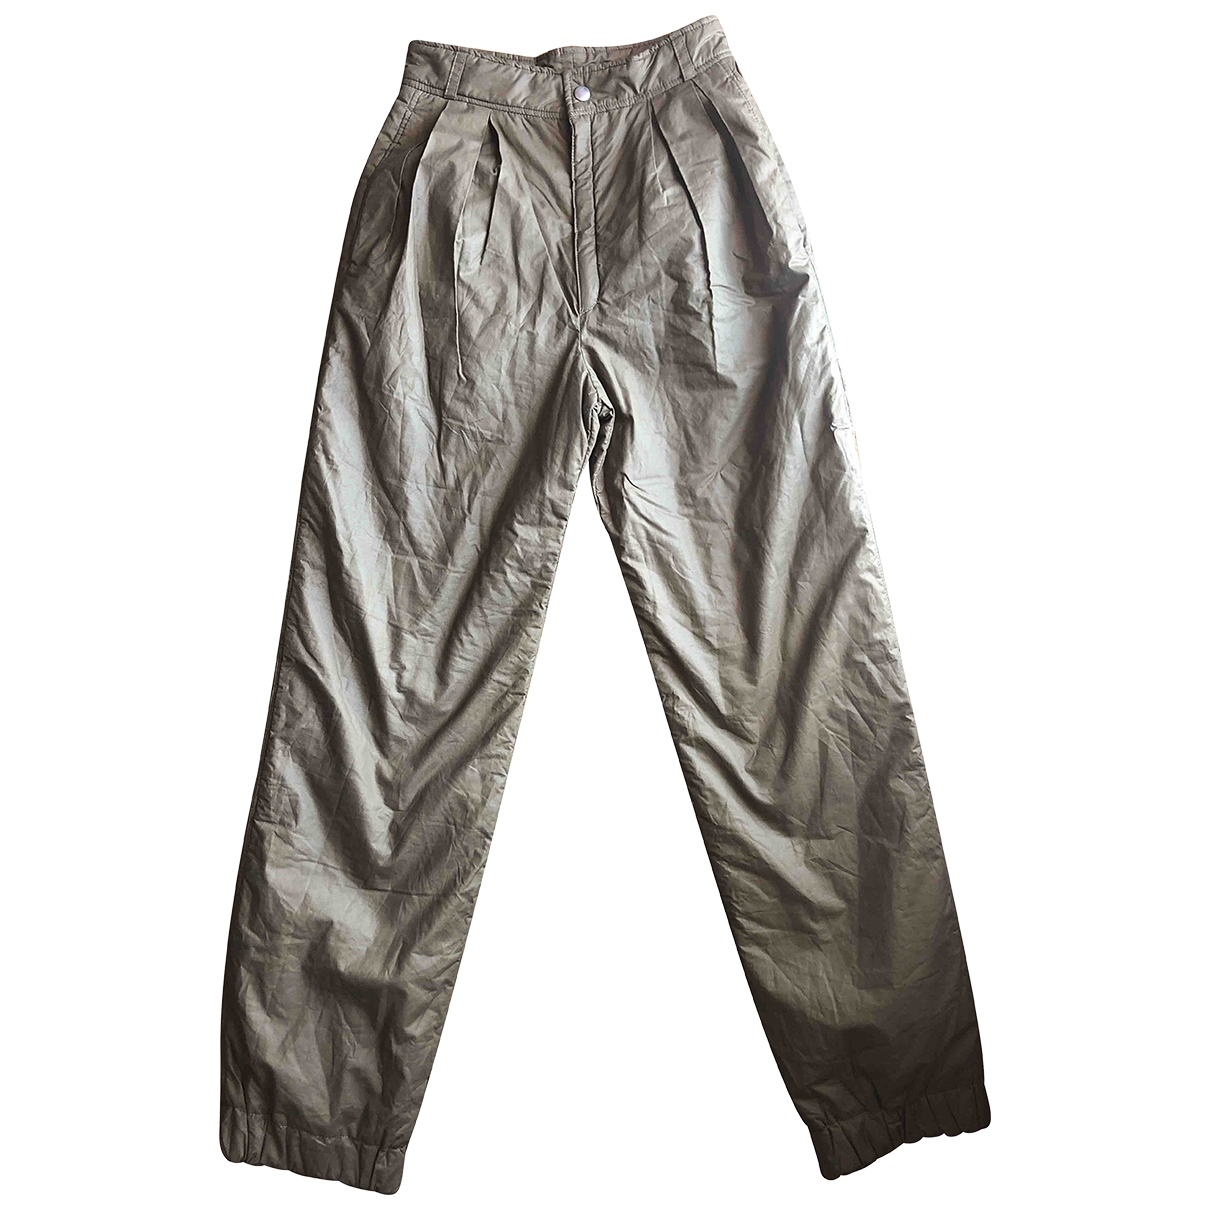 Valentino Garavani \N Beige Cotton Trousers for Women 42 IT